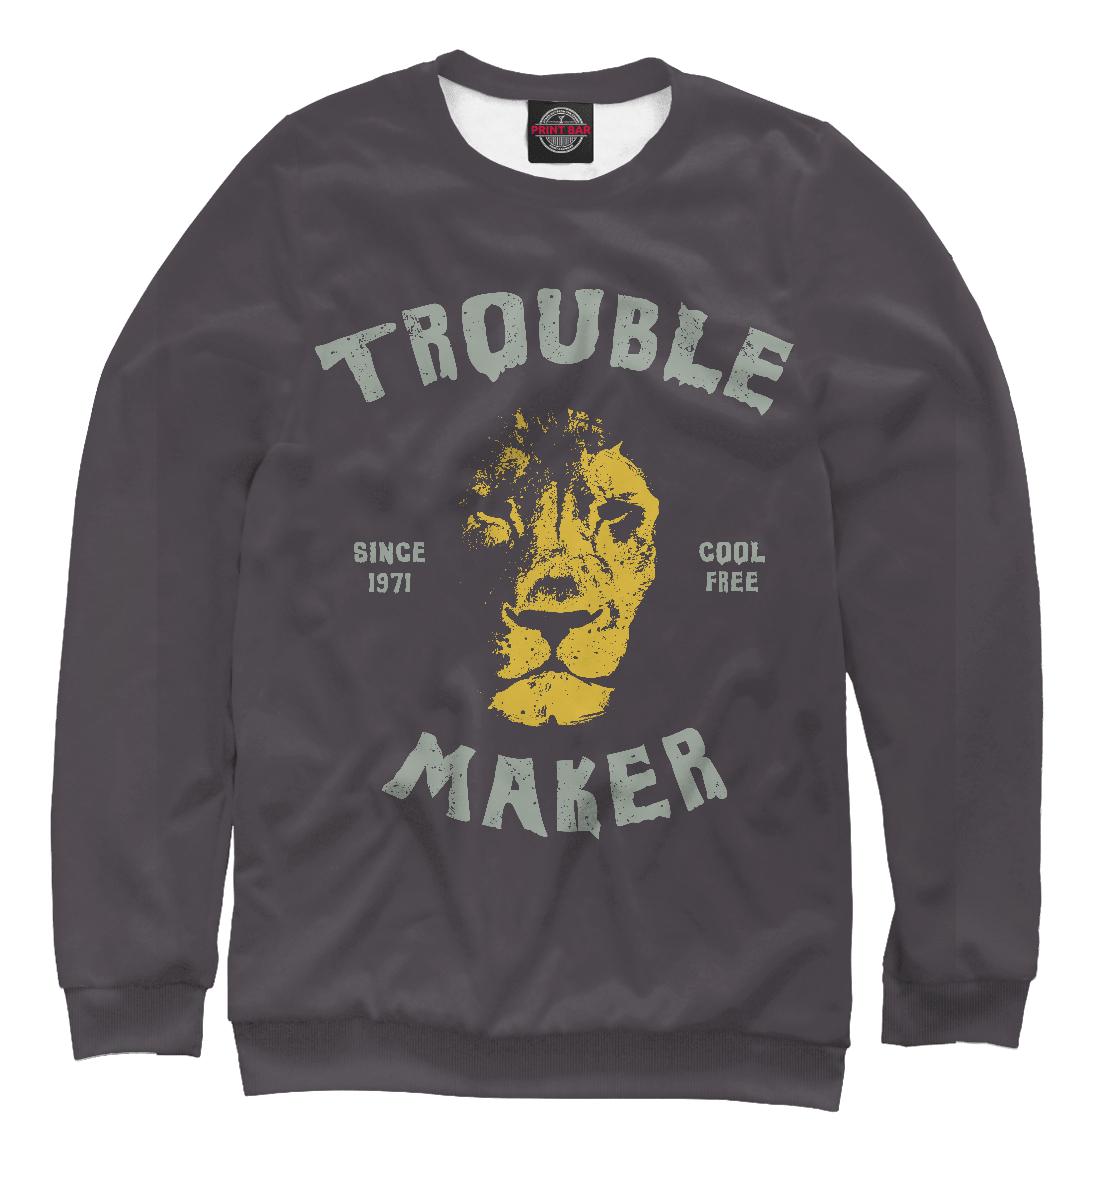 Фото - Trouble maker spring shape maker